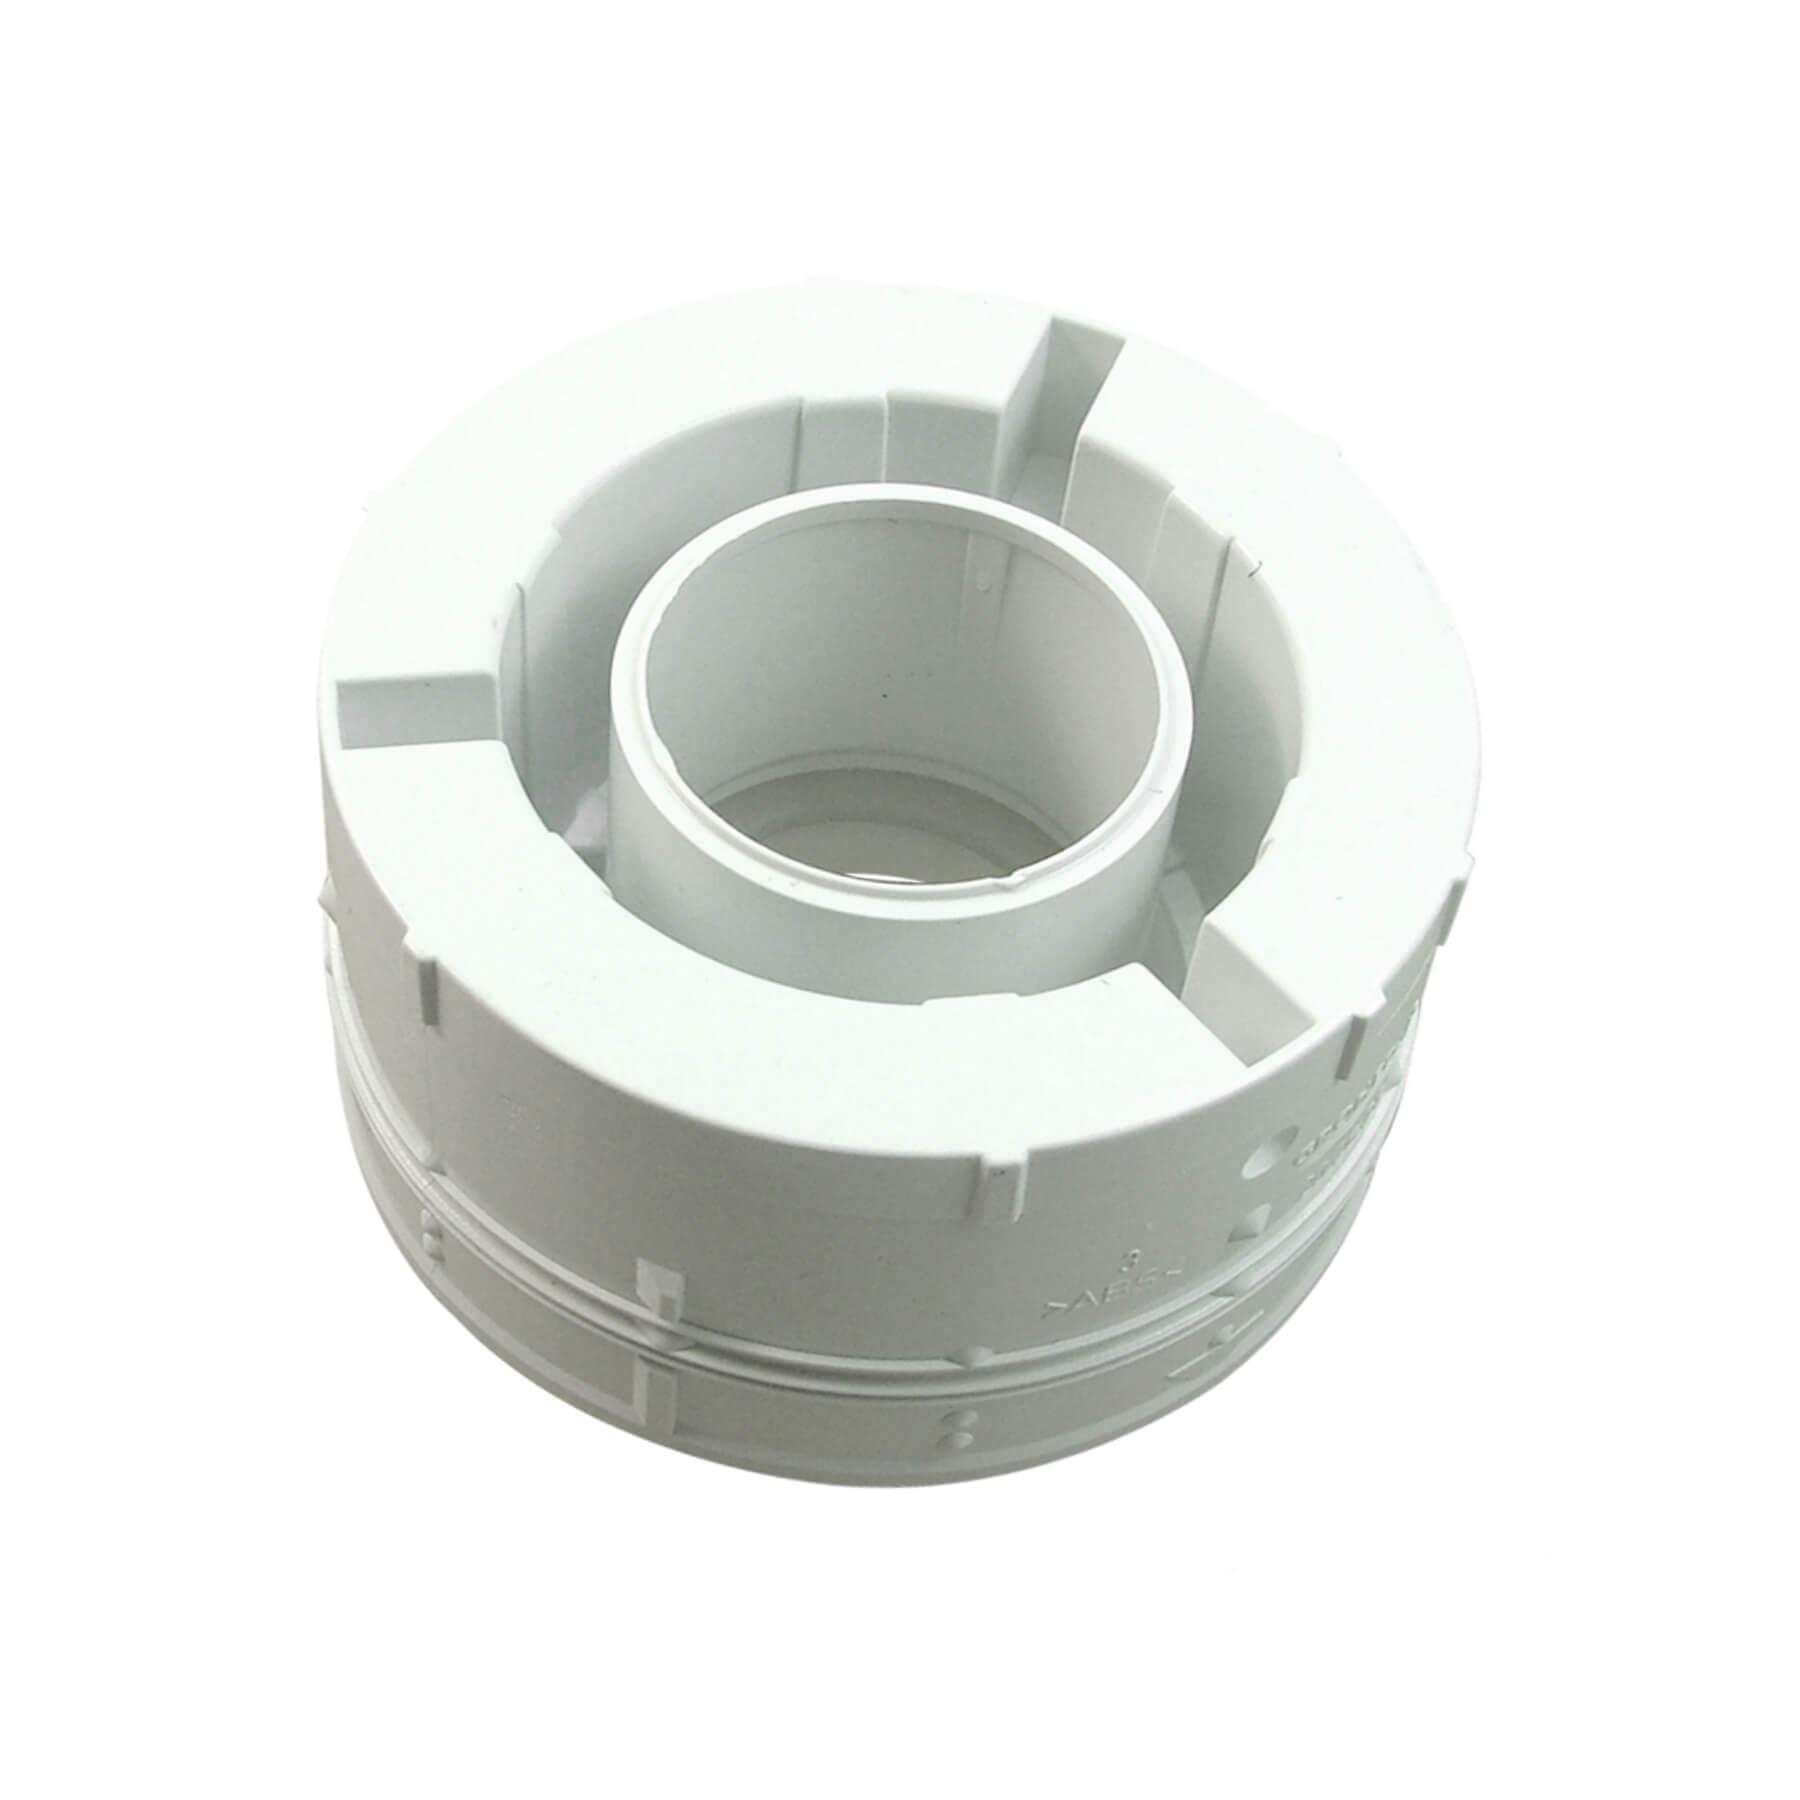 Grohe 43544000 Adagio Flush Valve Piston & Seals